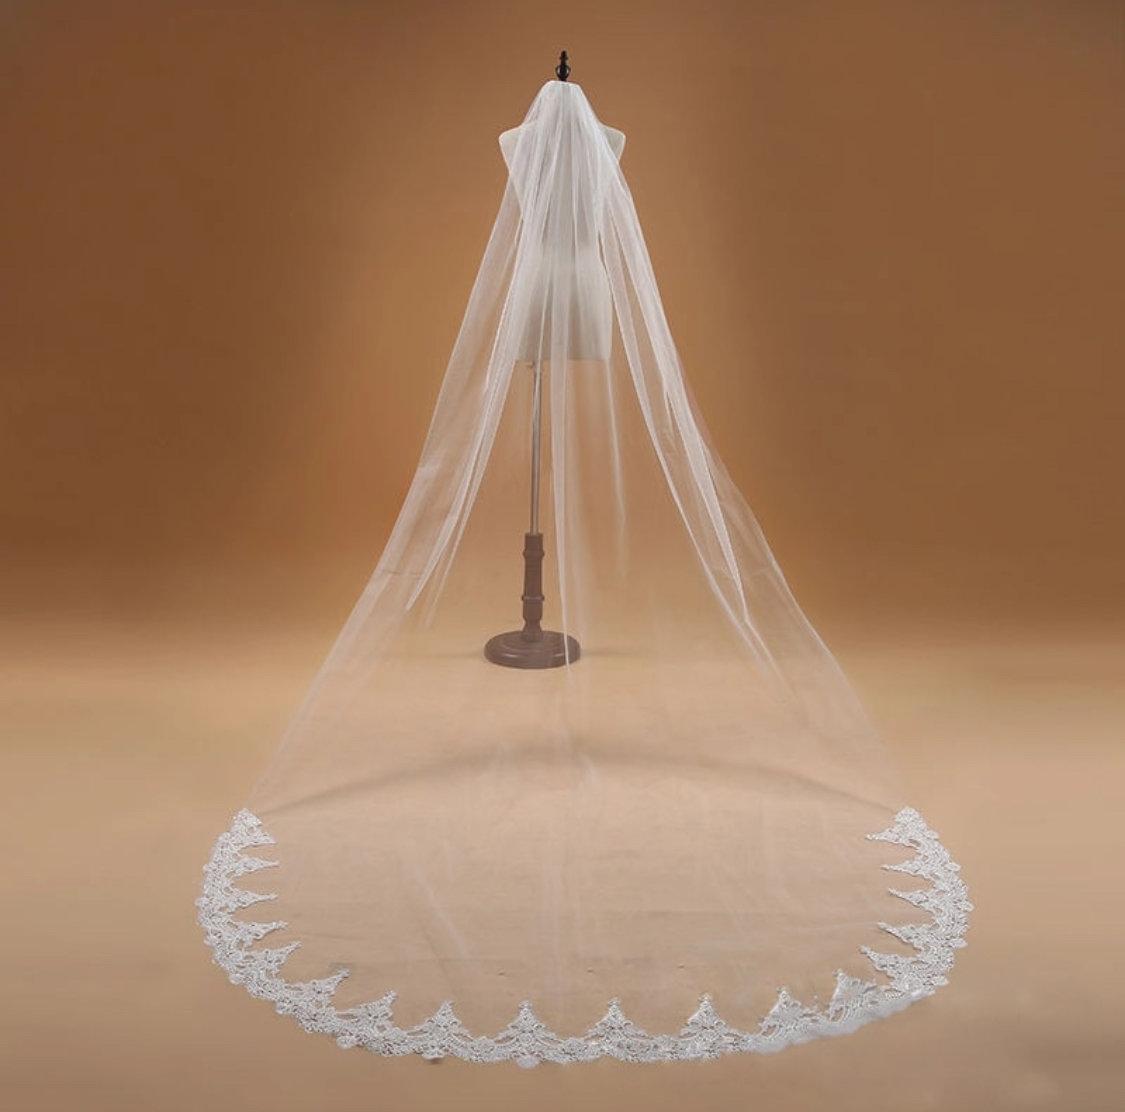 3m/10 ft White/Ivory lace appliqué edge cathedral veil